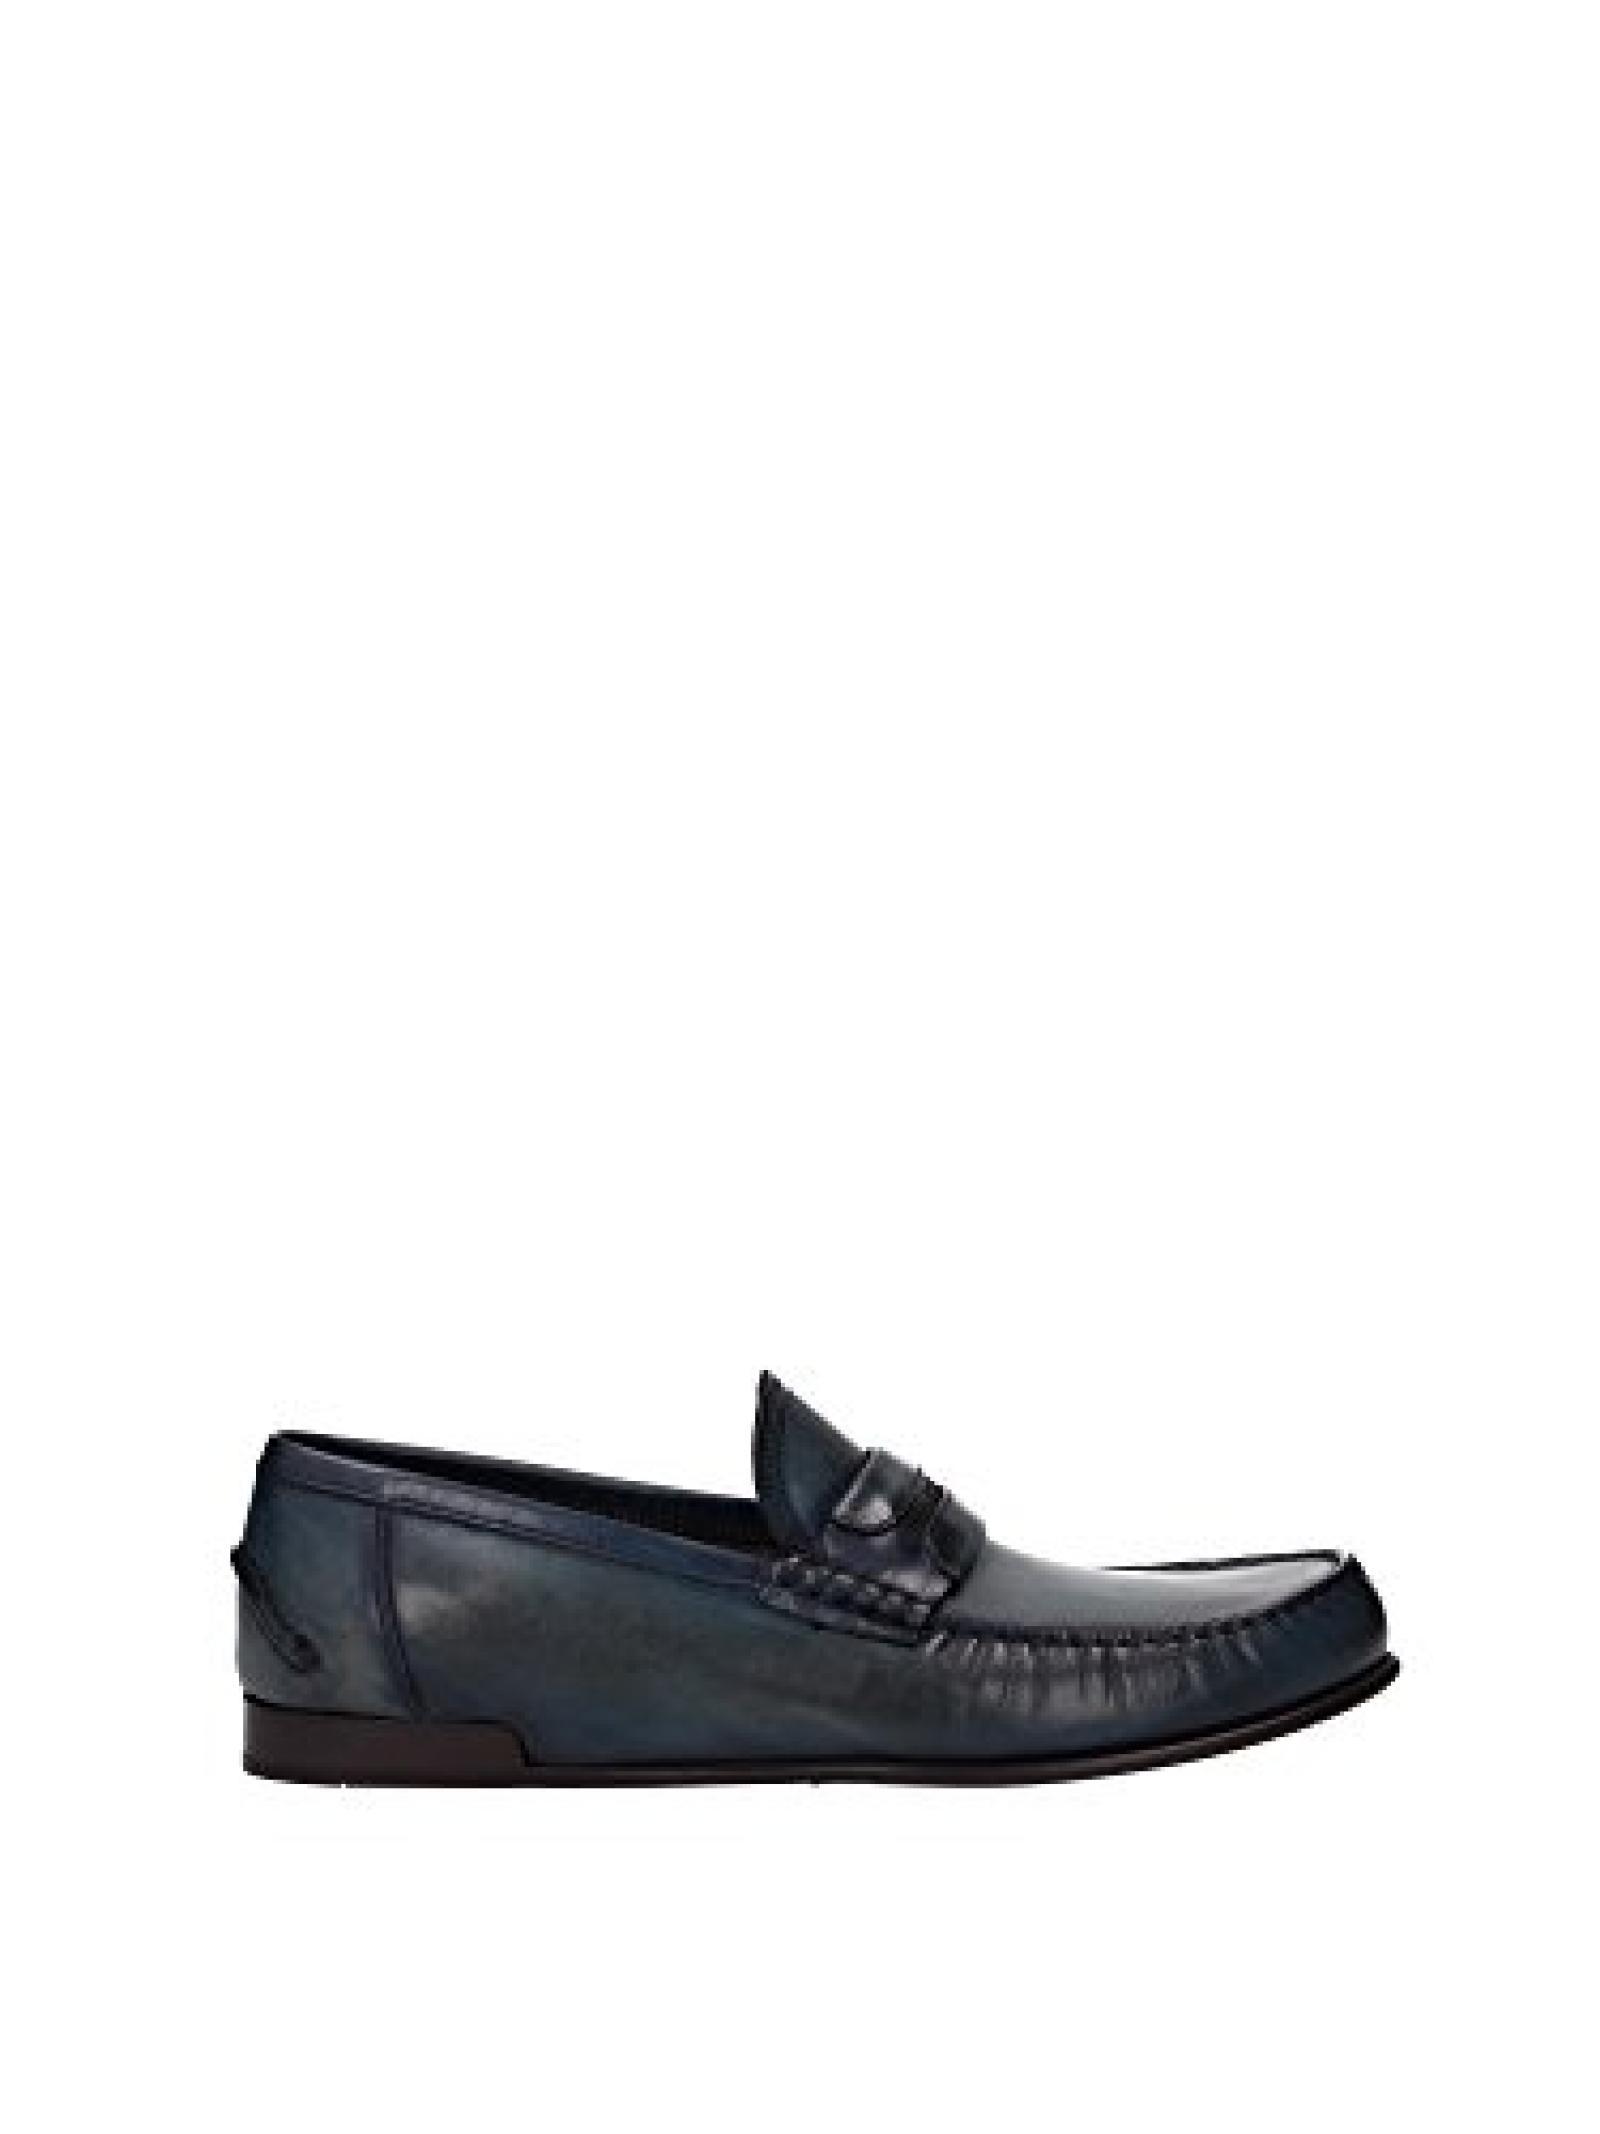 Dolce und Gabbana Halbschuhe blau Kalbsleder - Modellnummer: CA6057 A1560 80653